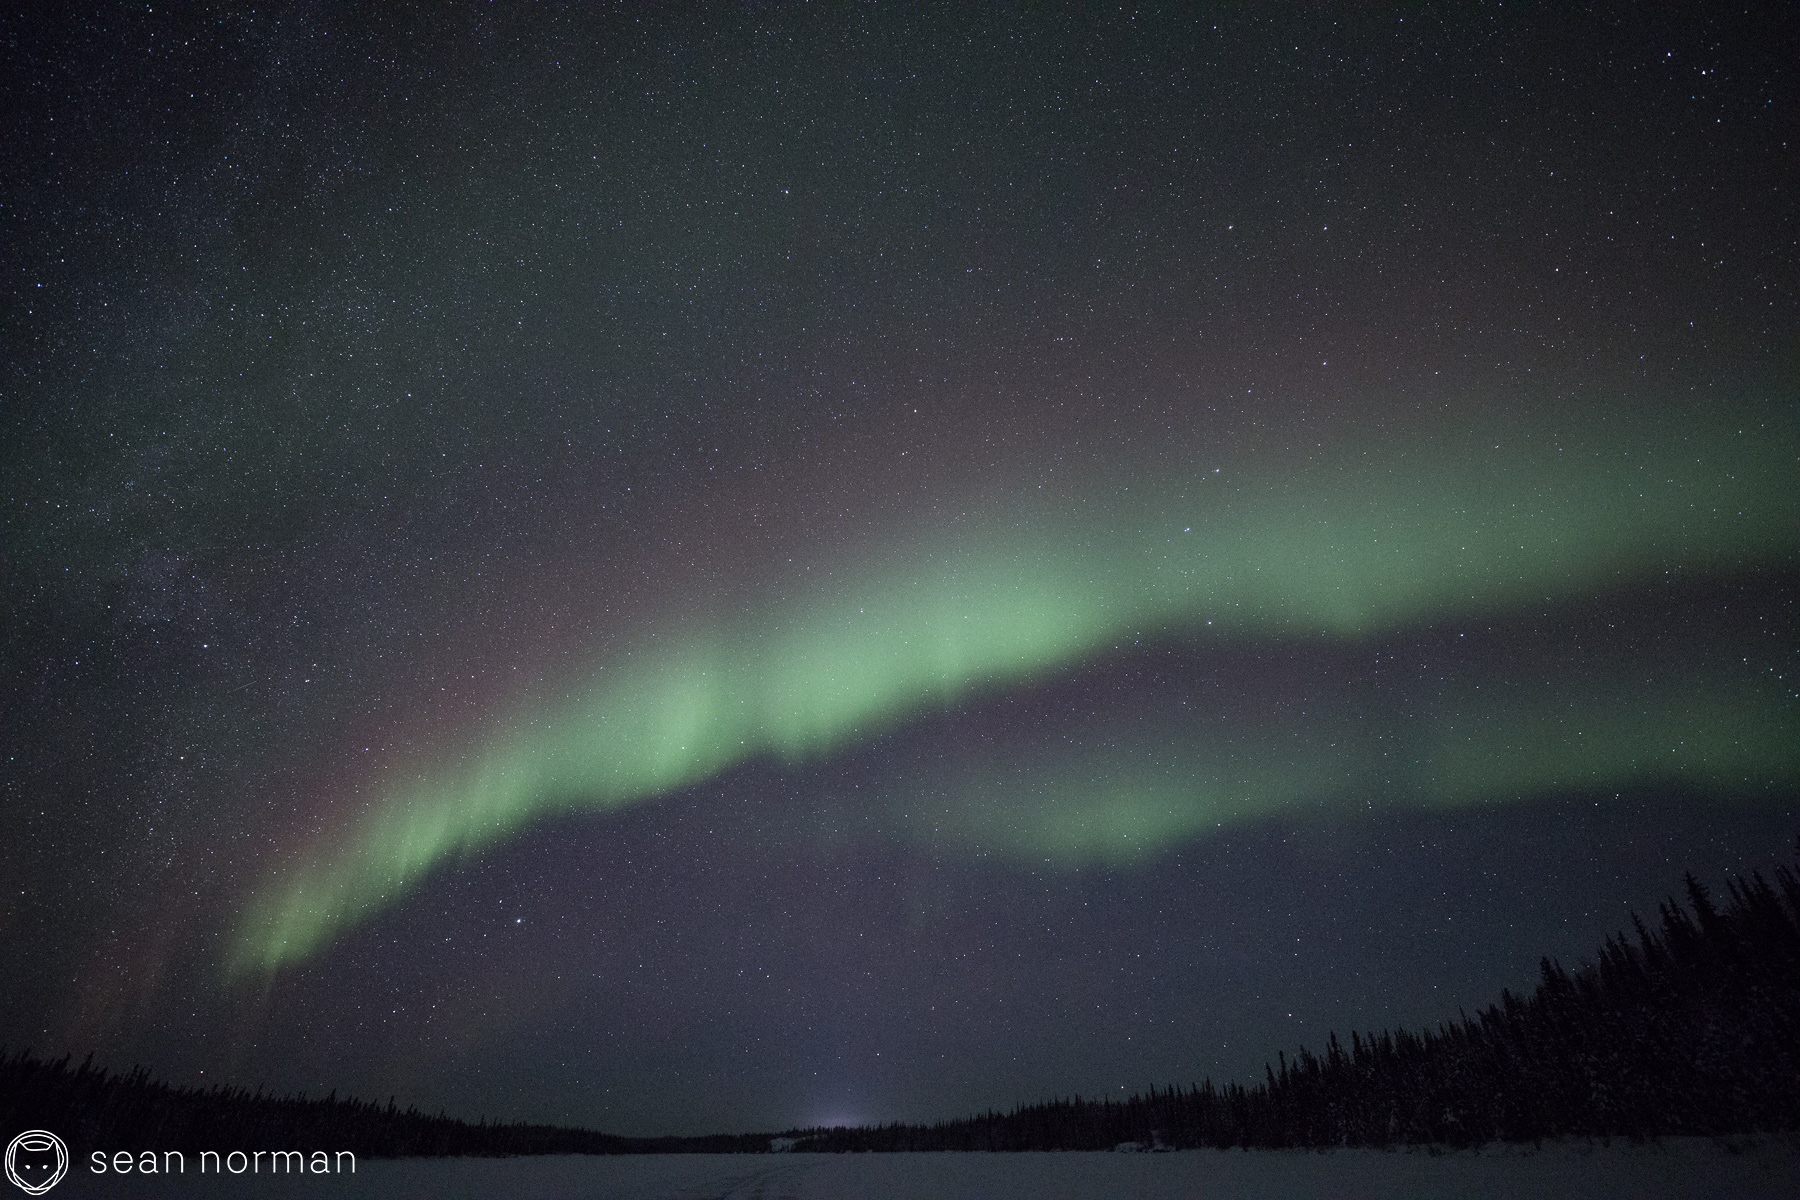 Sean Norman Yellowknife Aurora Chaser - Northern Light Photography - 1.jpg